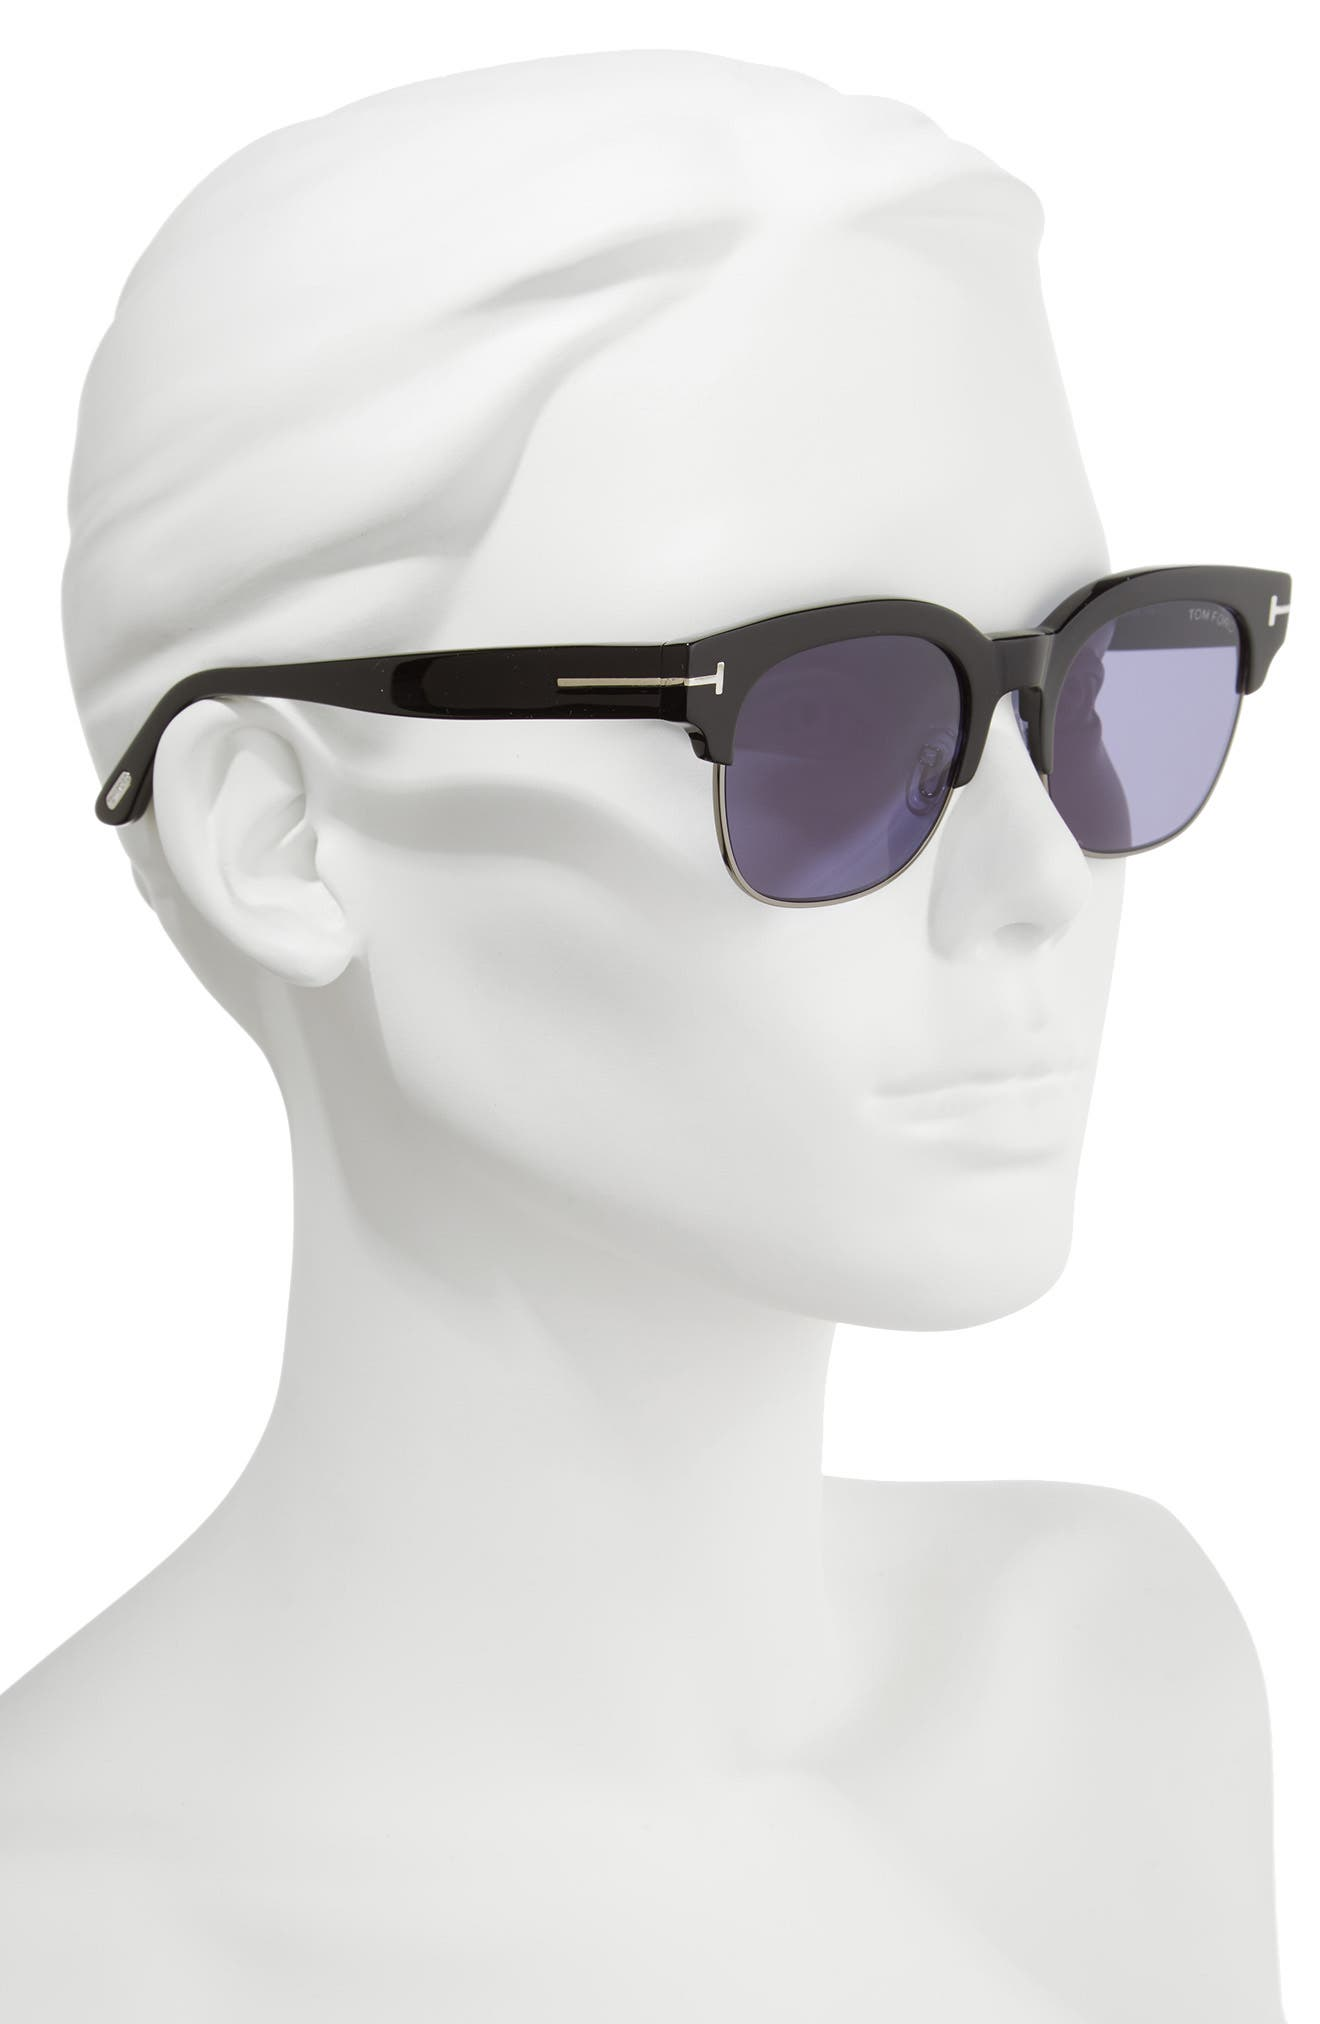 Harry 53mm Half-Rim Sunglasses,                             Alternate thumbnail 2, color,                             BLACK/ DARK RUTHENIUM/ BLUE